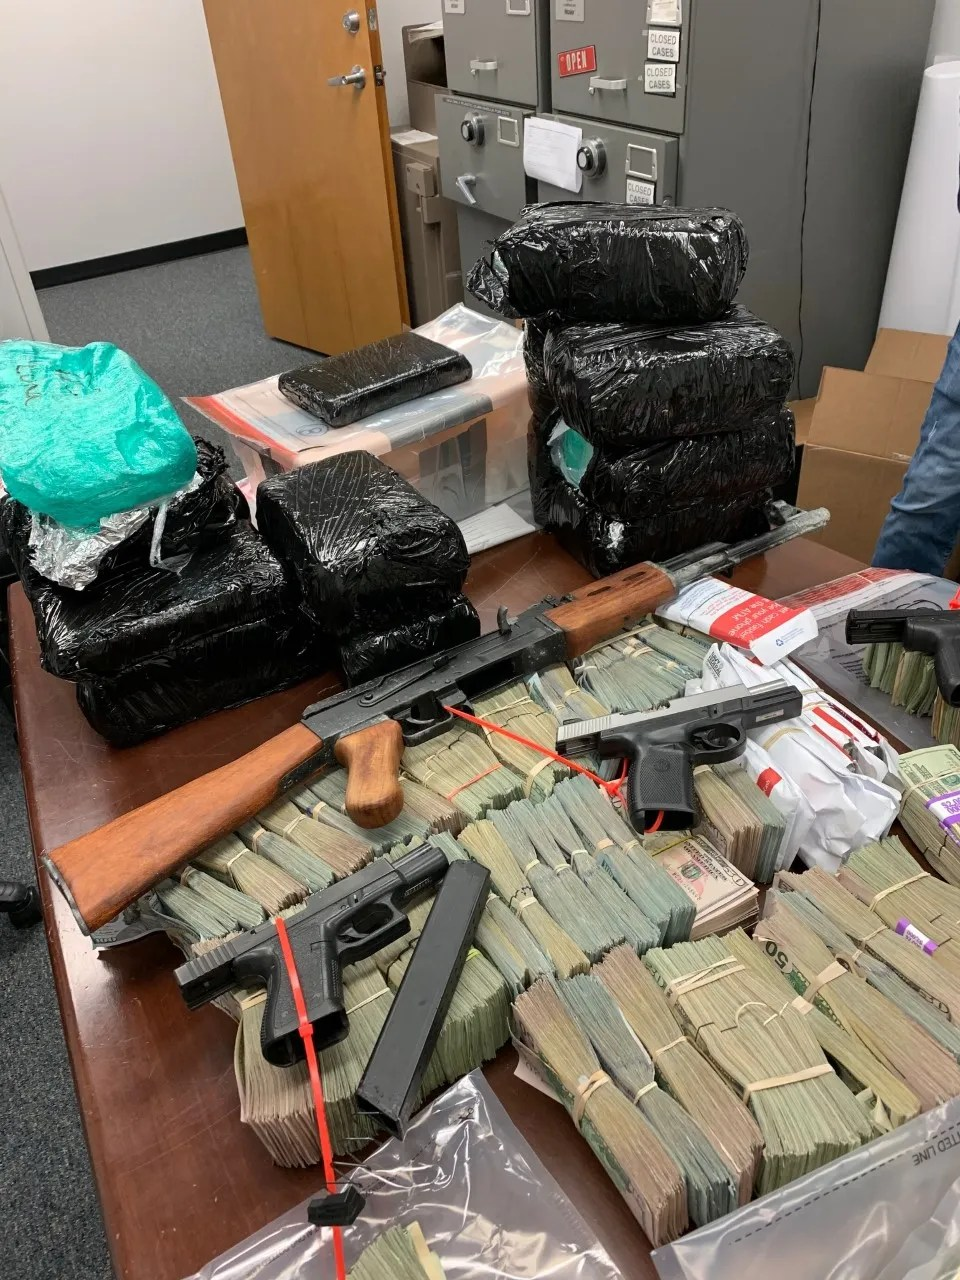 Piles of guns, drugs and drug money